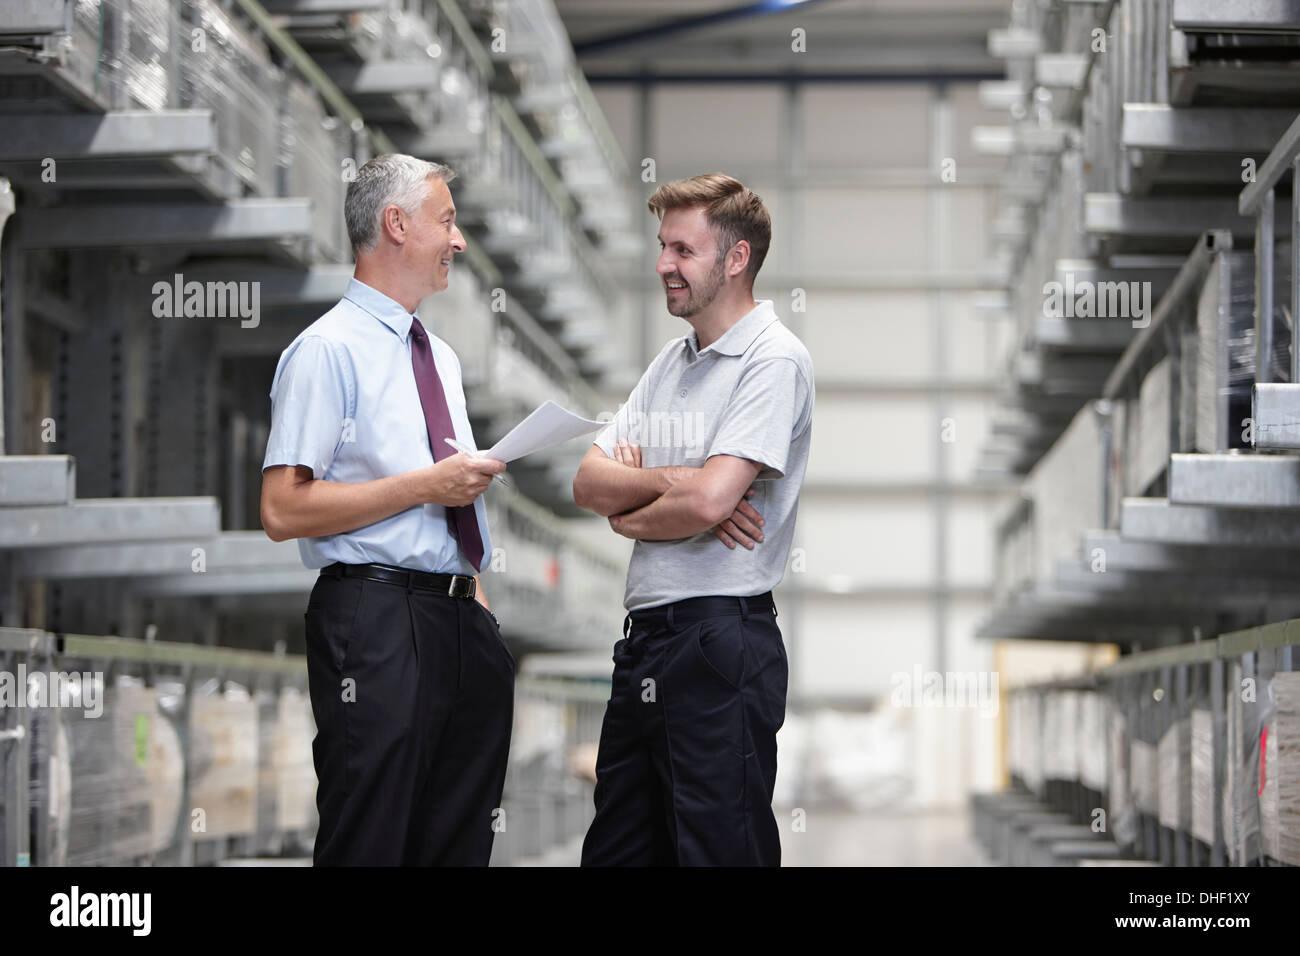 Travailleur et manager warehouse Photo Stock